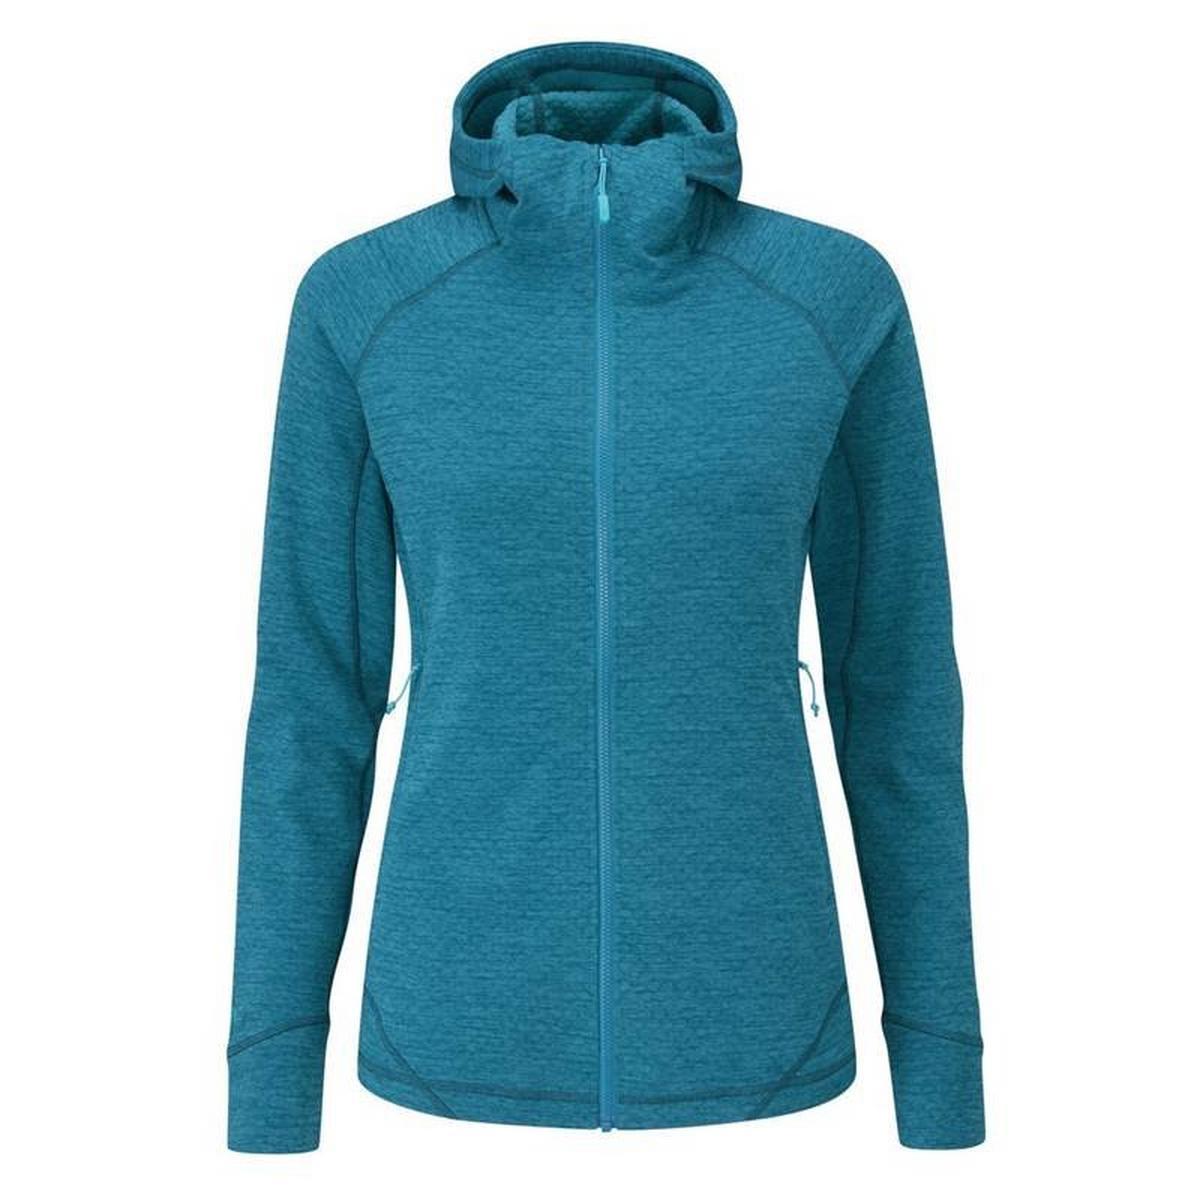 Rab Women's Nexus Hooded Jacket - Ultramarine